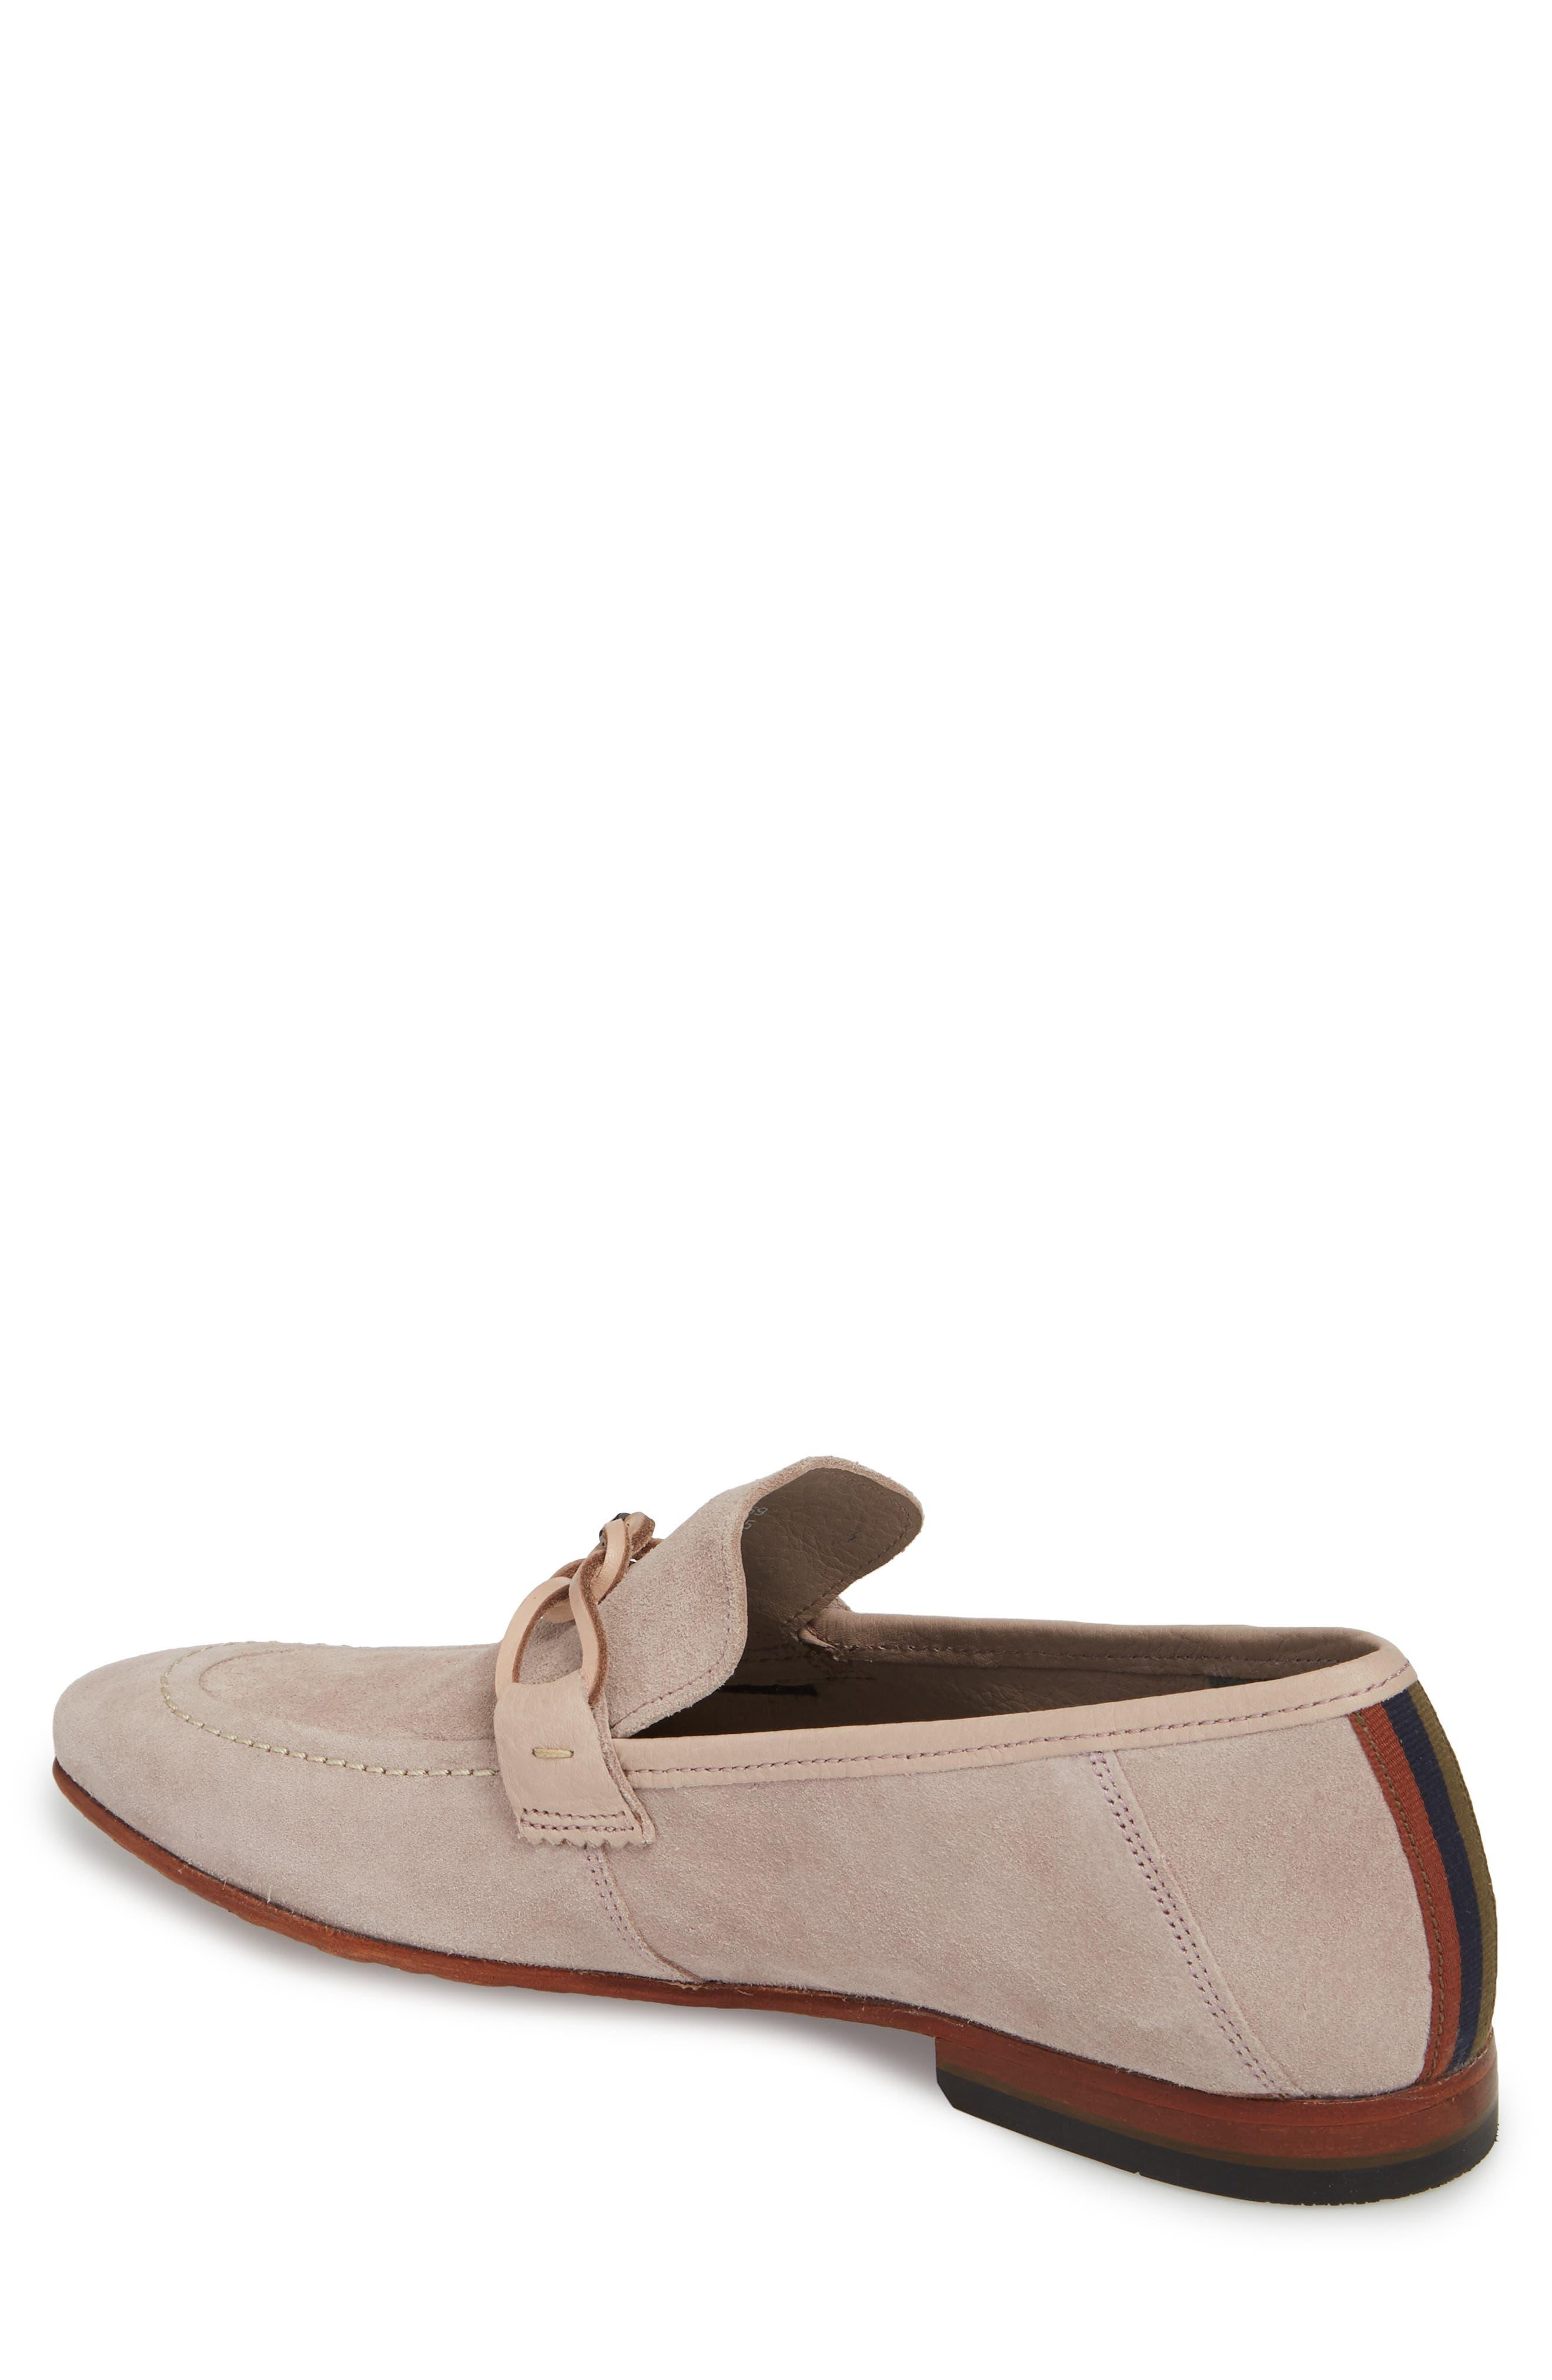 Hoppken Convertible Knotted Loafer,                             Alternate thumbnail 2, color,                             Light Pink Suede